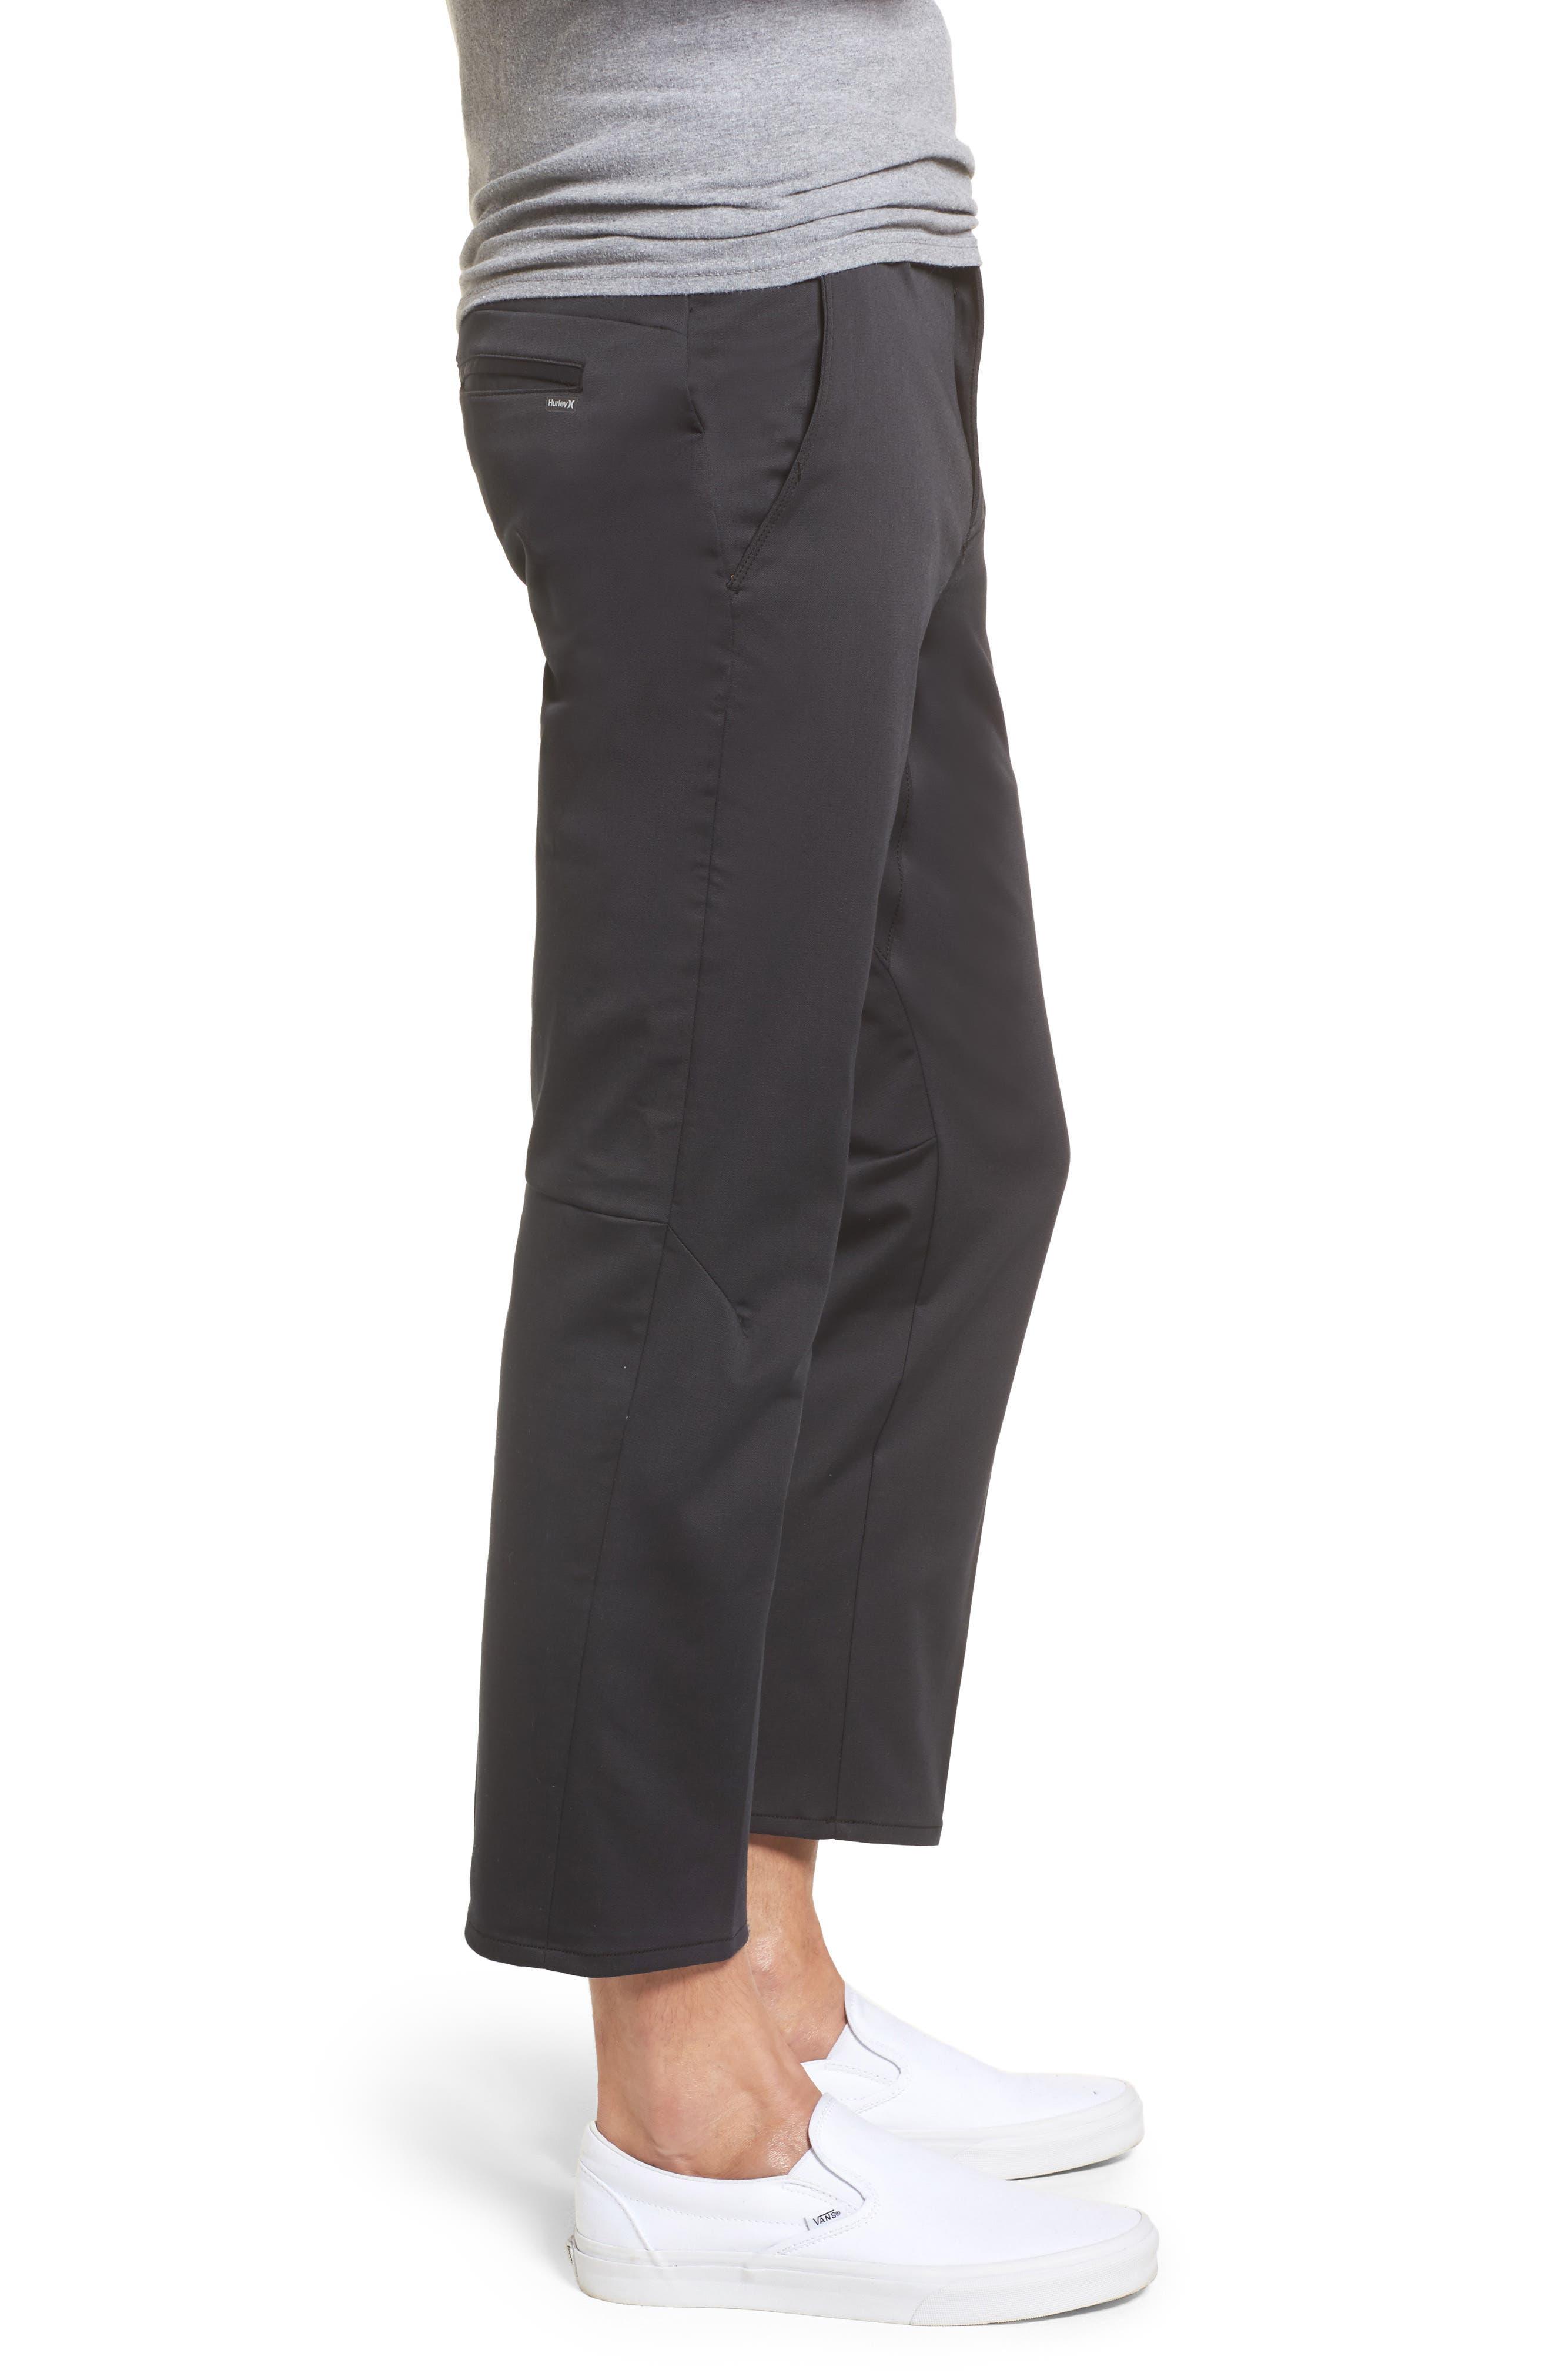 Covert Slim Fit Crop Pants,                             Alternate thumbnail 3, color,                             Black